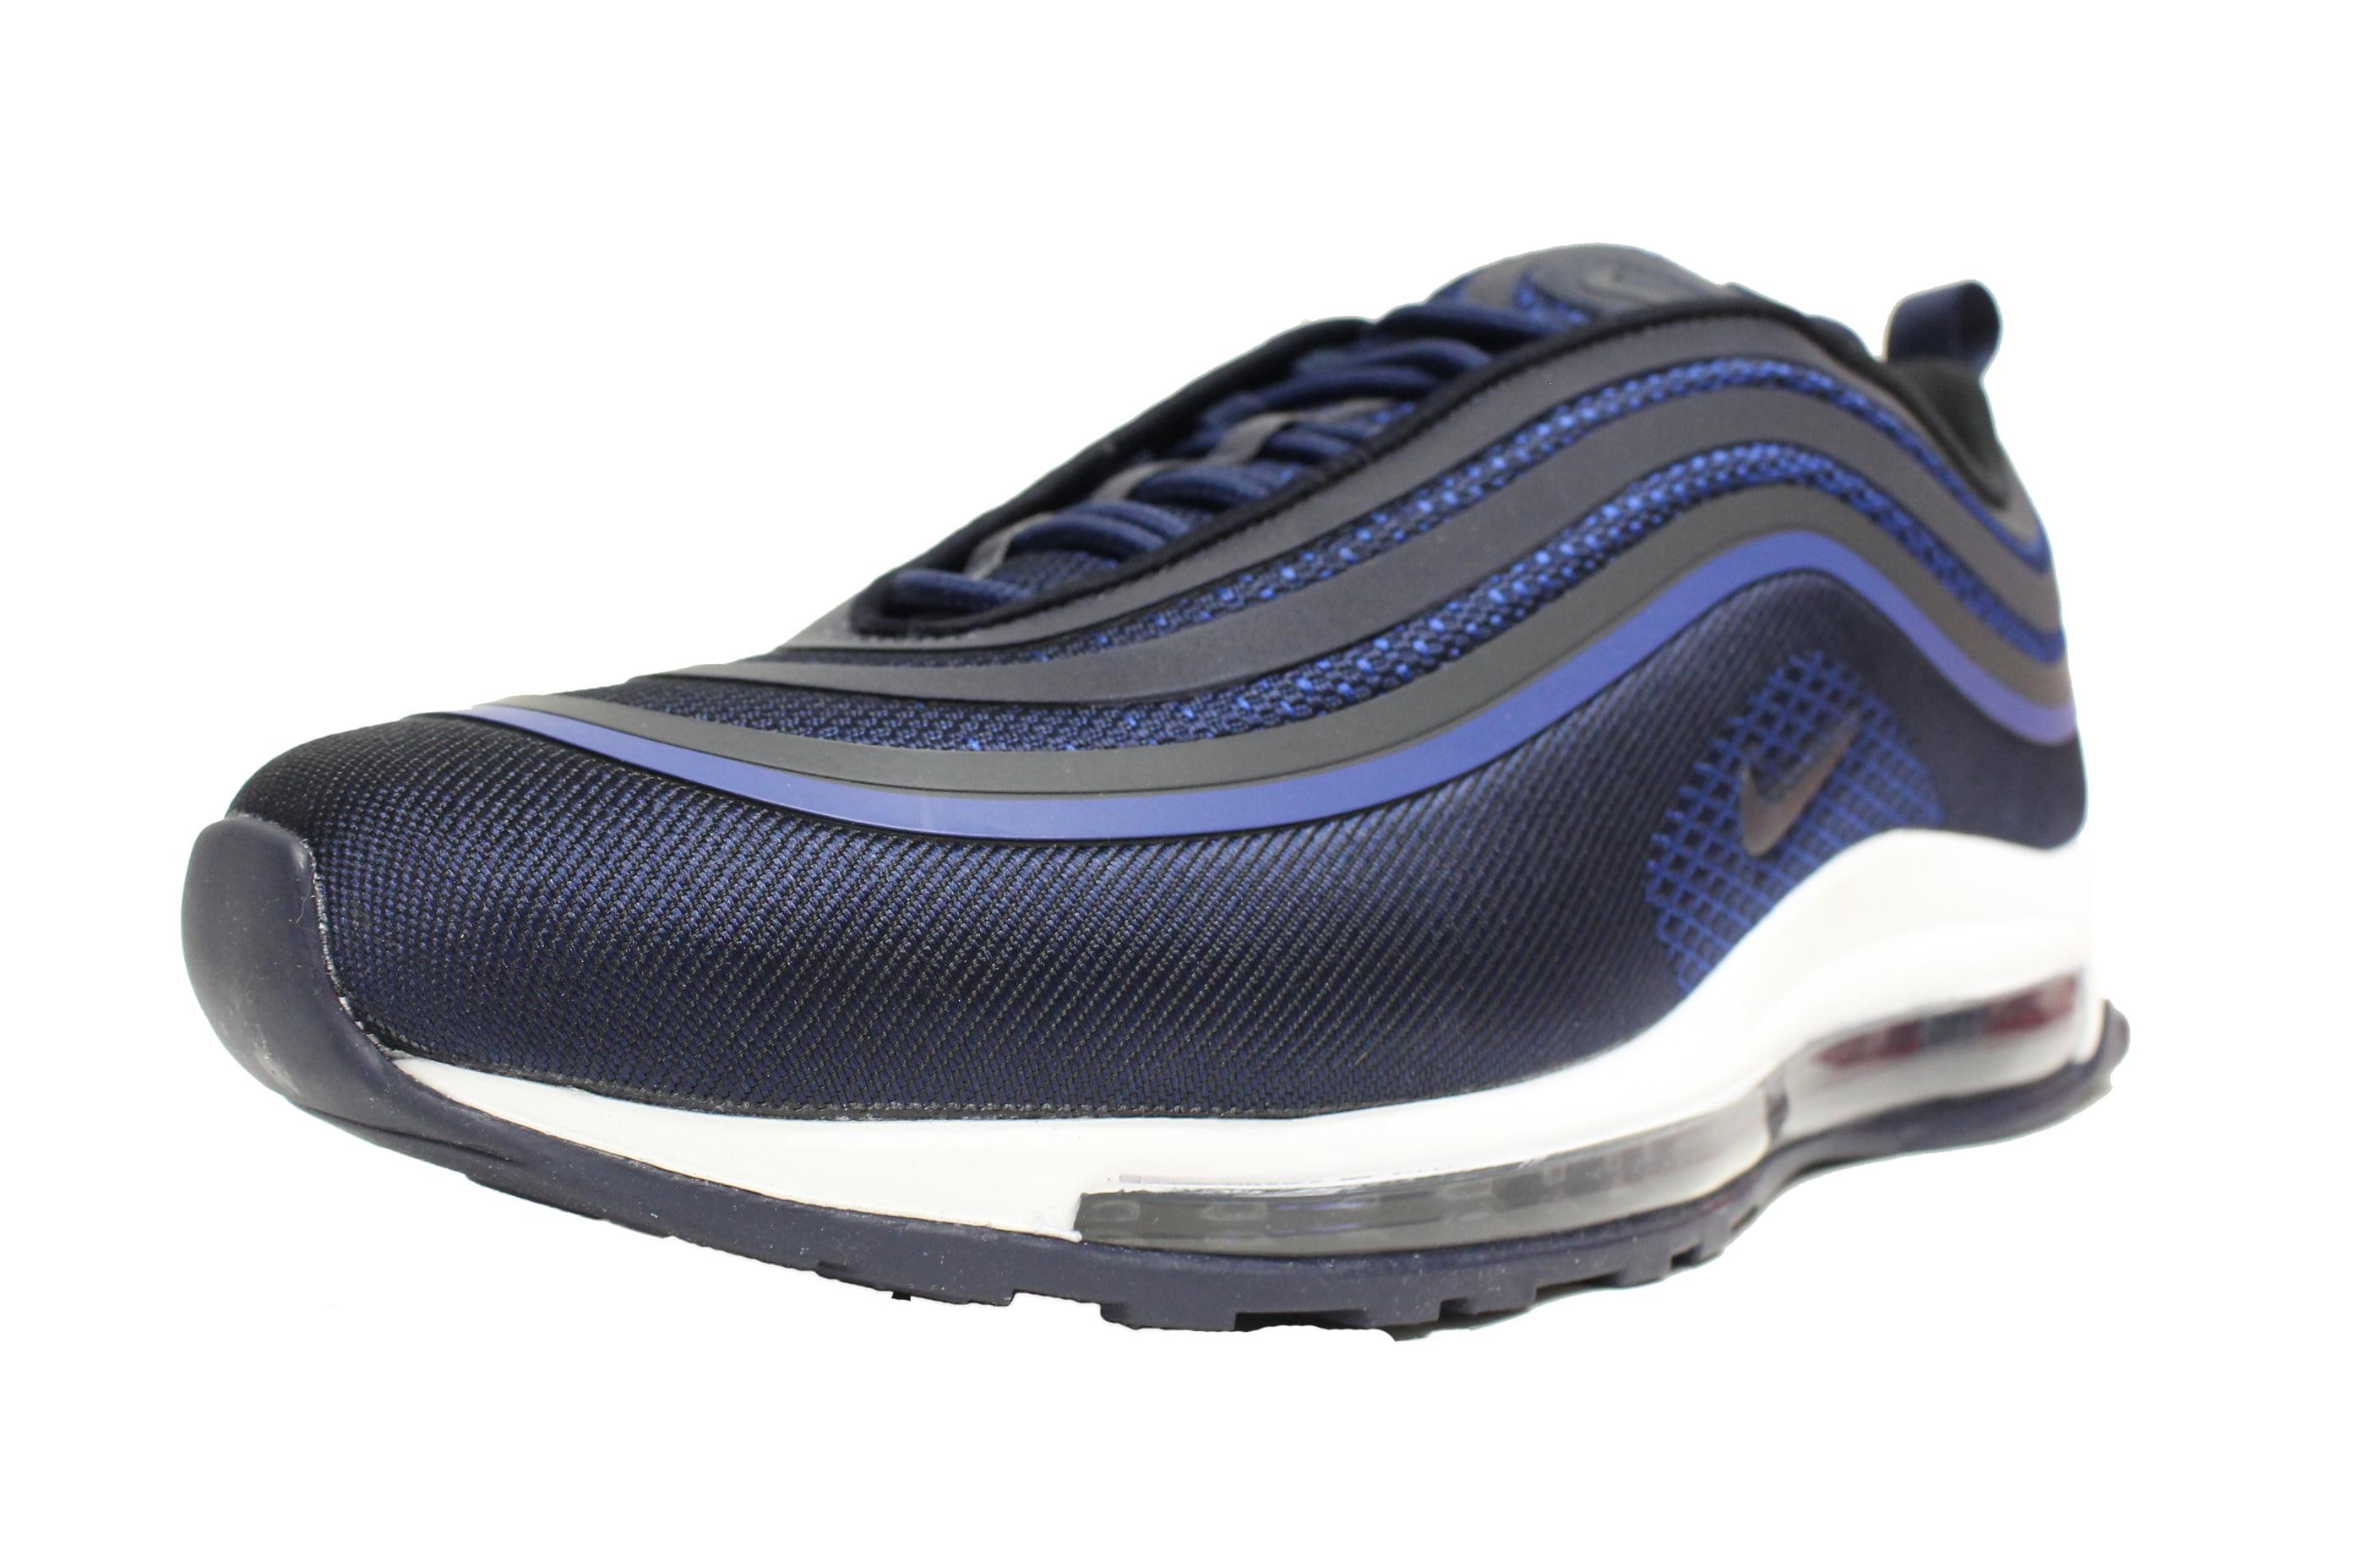 Nike - NIKE AIR MAX 97 ULTRA UL 17 SZ 12 OBSIDIAN NAVY BLUE WHITE 2017 918356  401 - Walmart.com 85390fe9dc5a